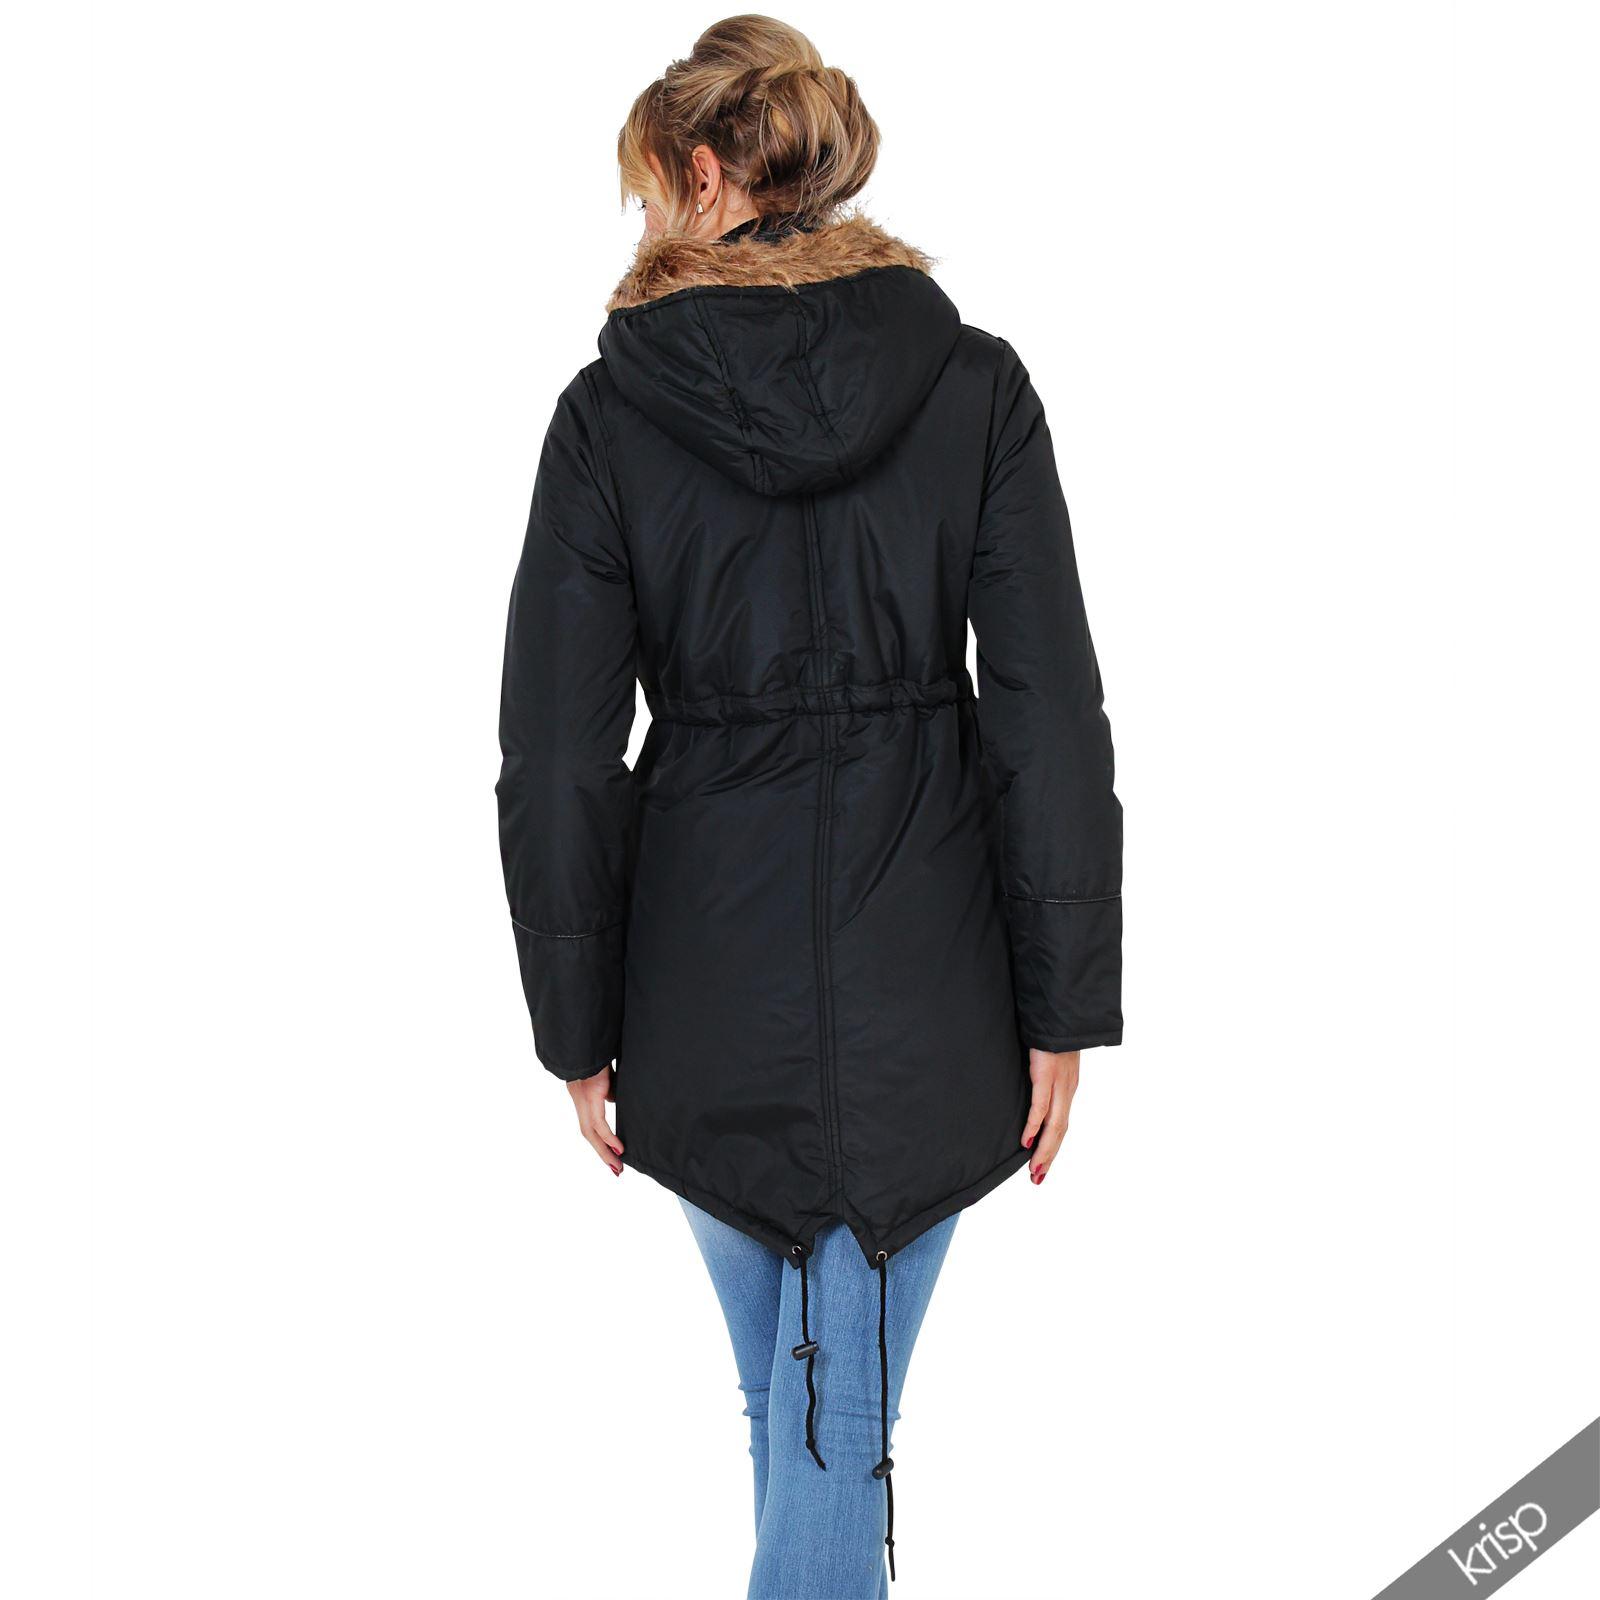 Women anorak jacket